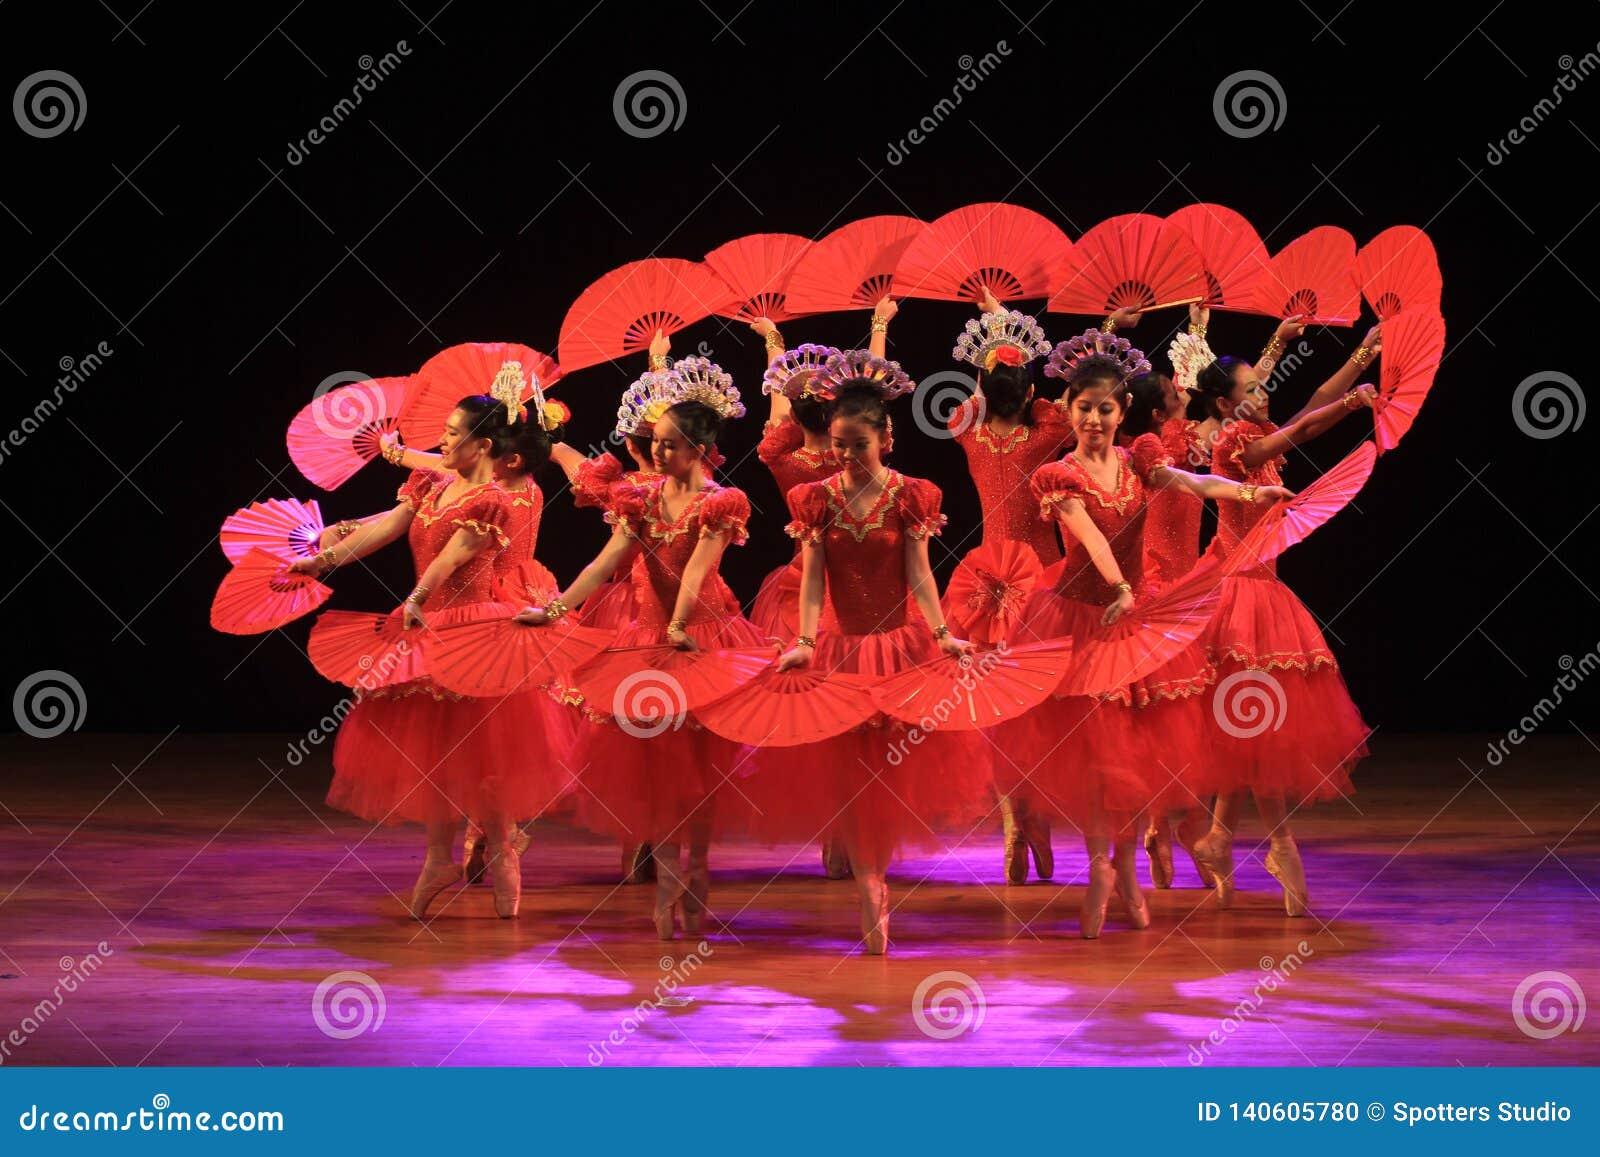 Surabaya indonesia, july 29 2016. ballet dance performances